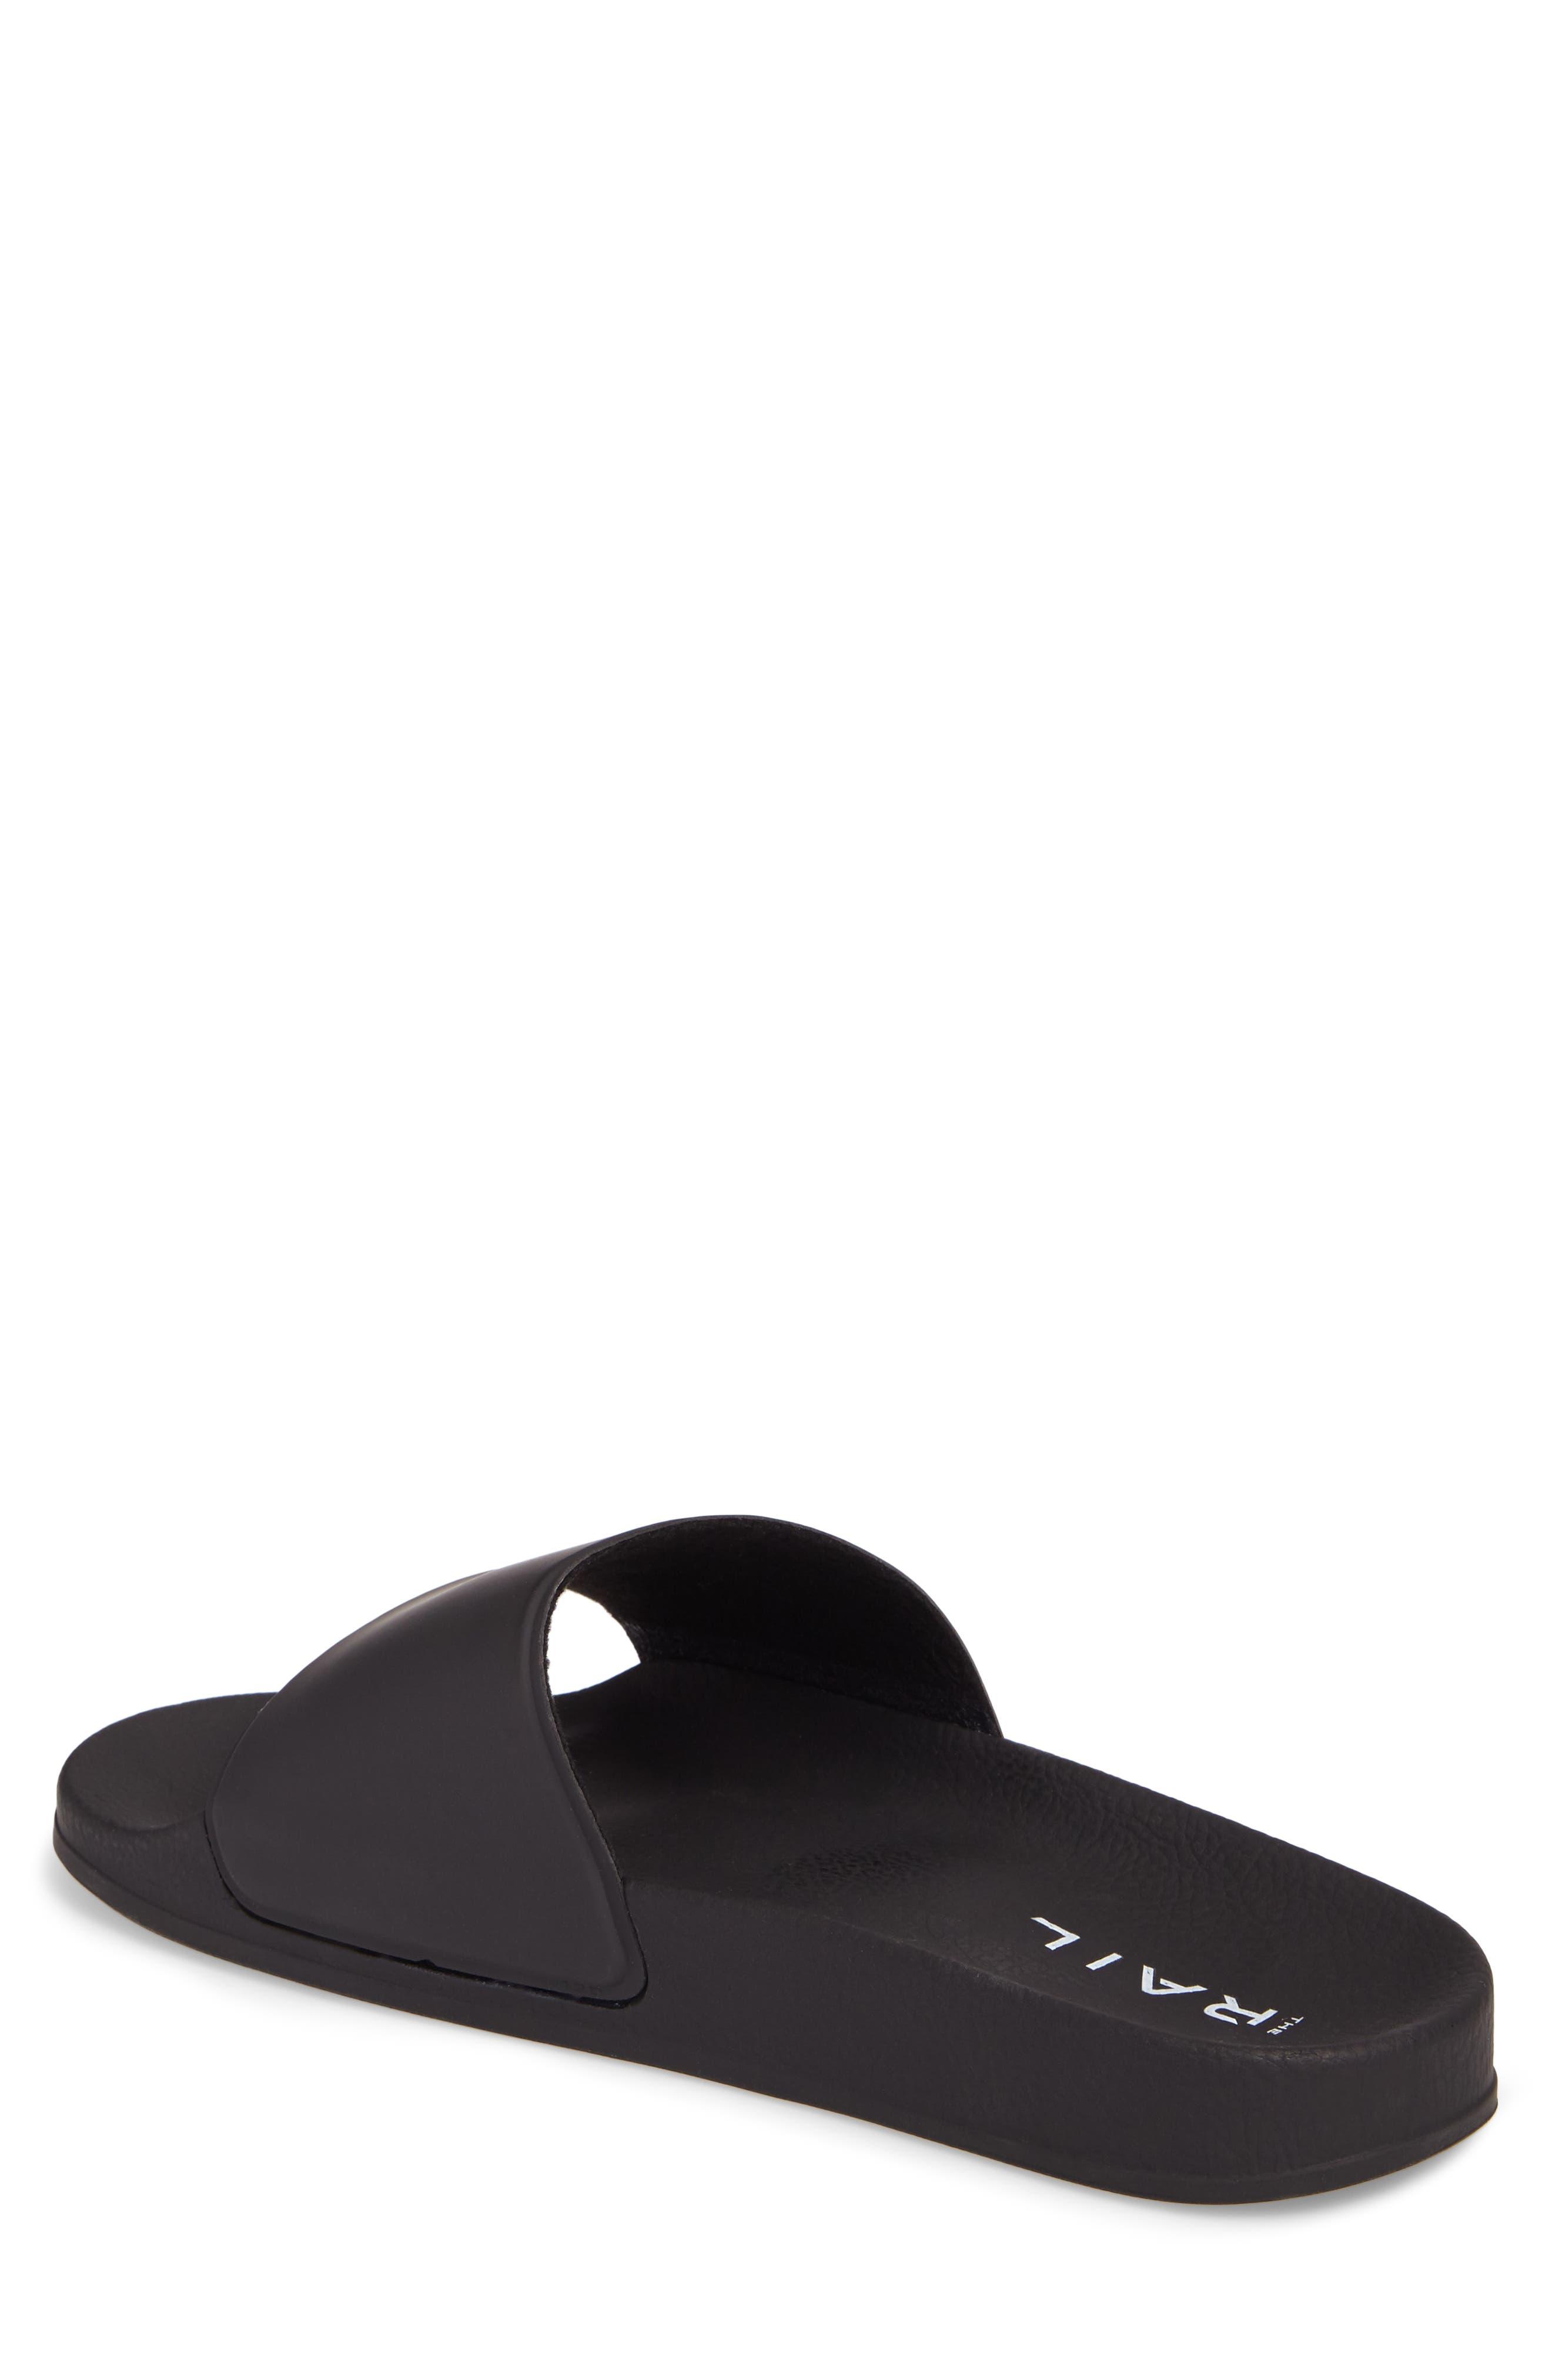 Bondi Slide Sandal,                             Alternate thumbnail 2, color,                             BLACK